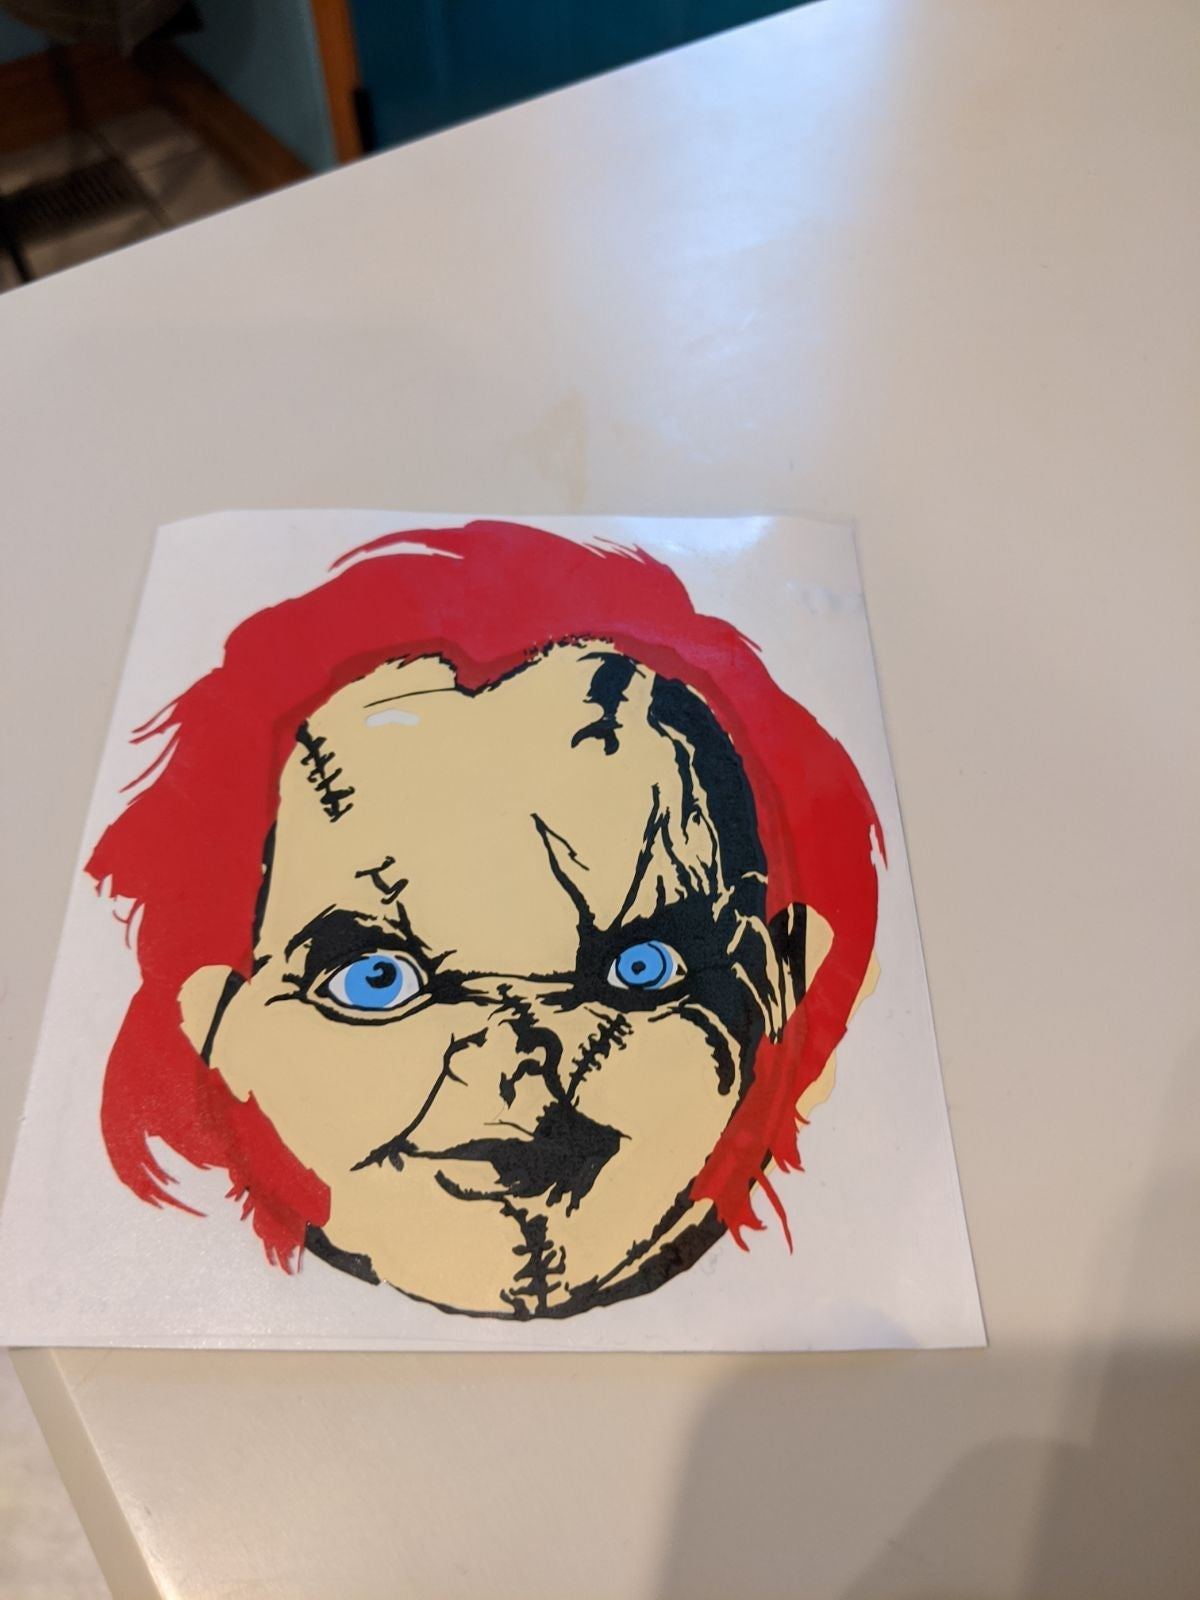 Child's play vinyl decal